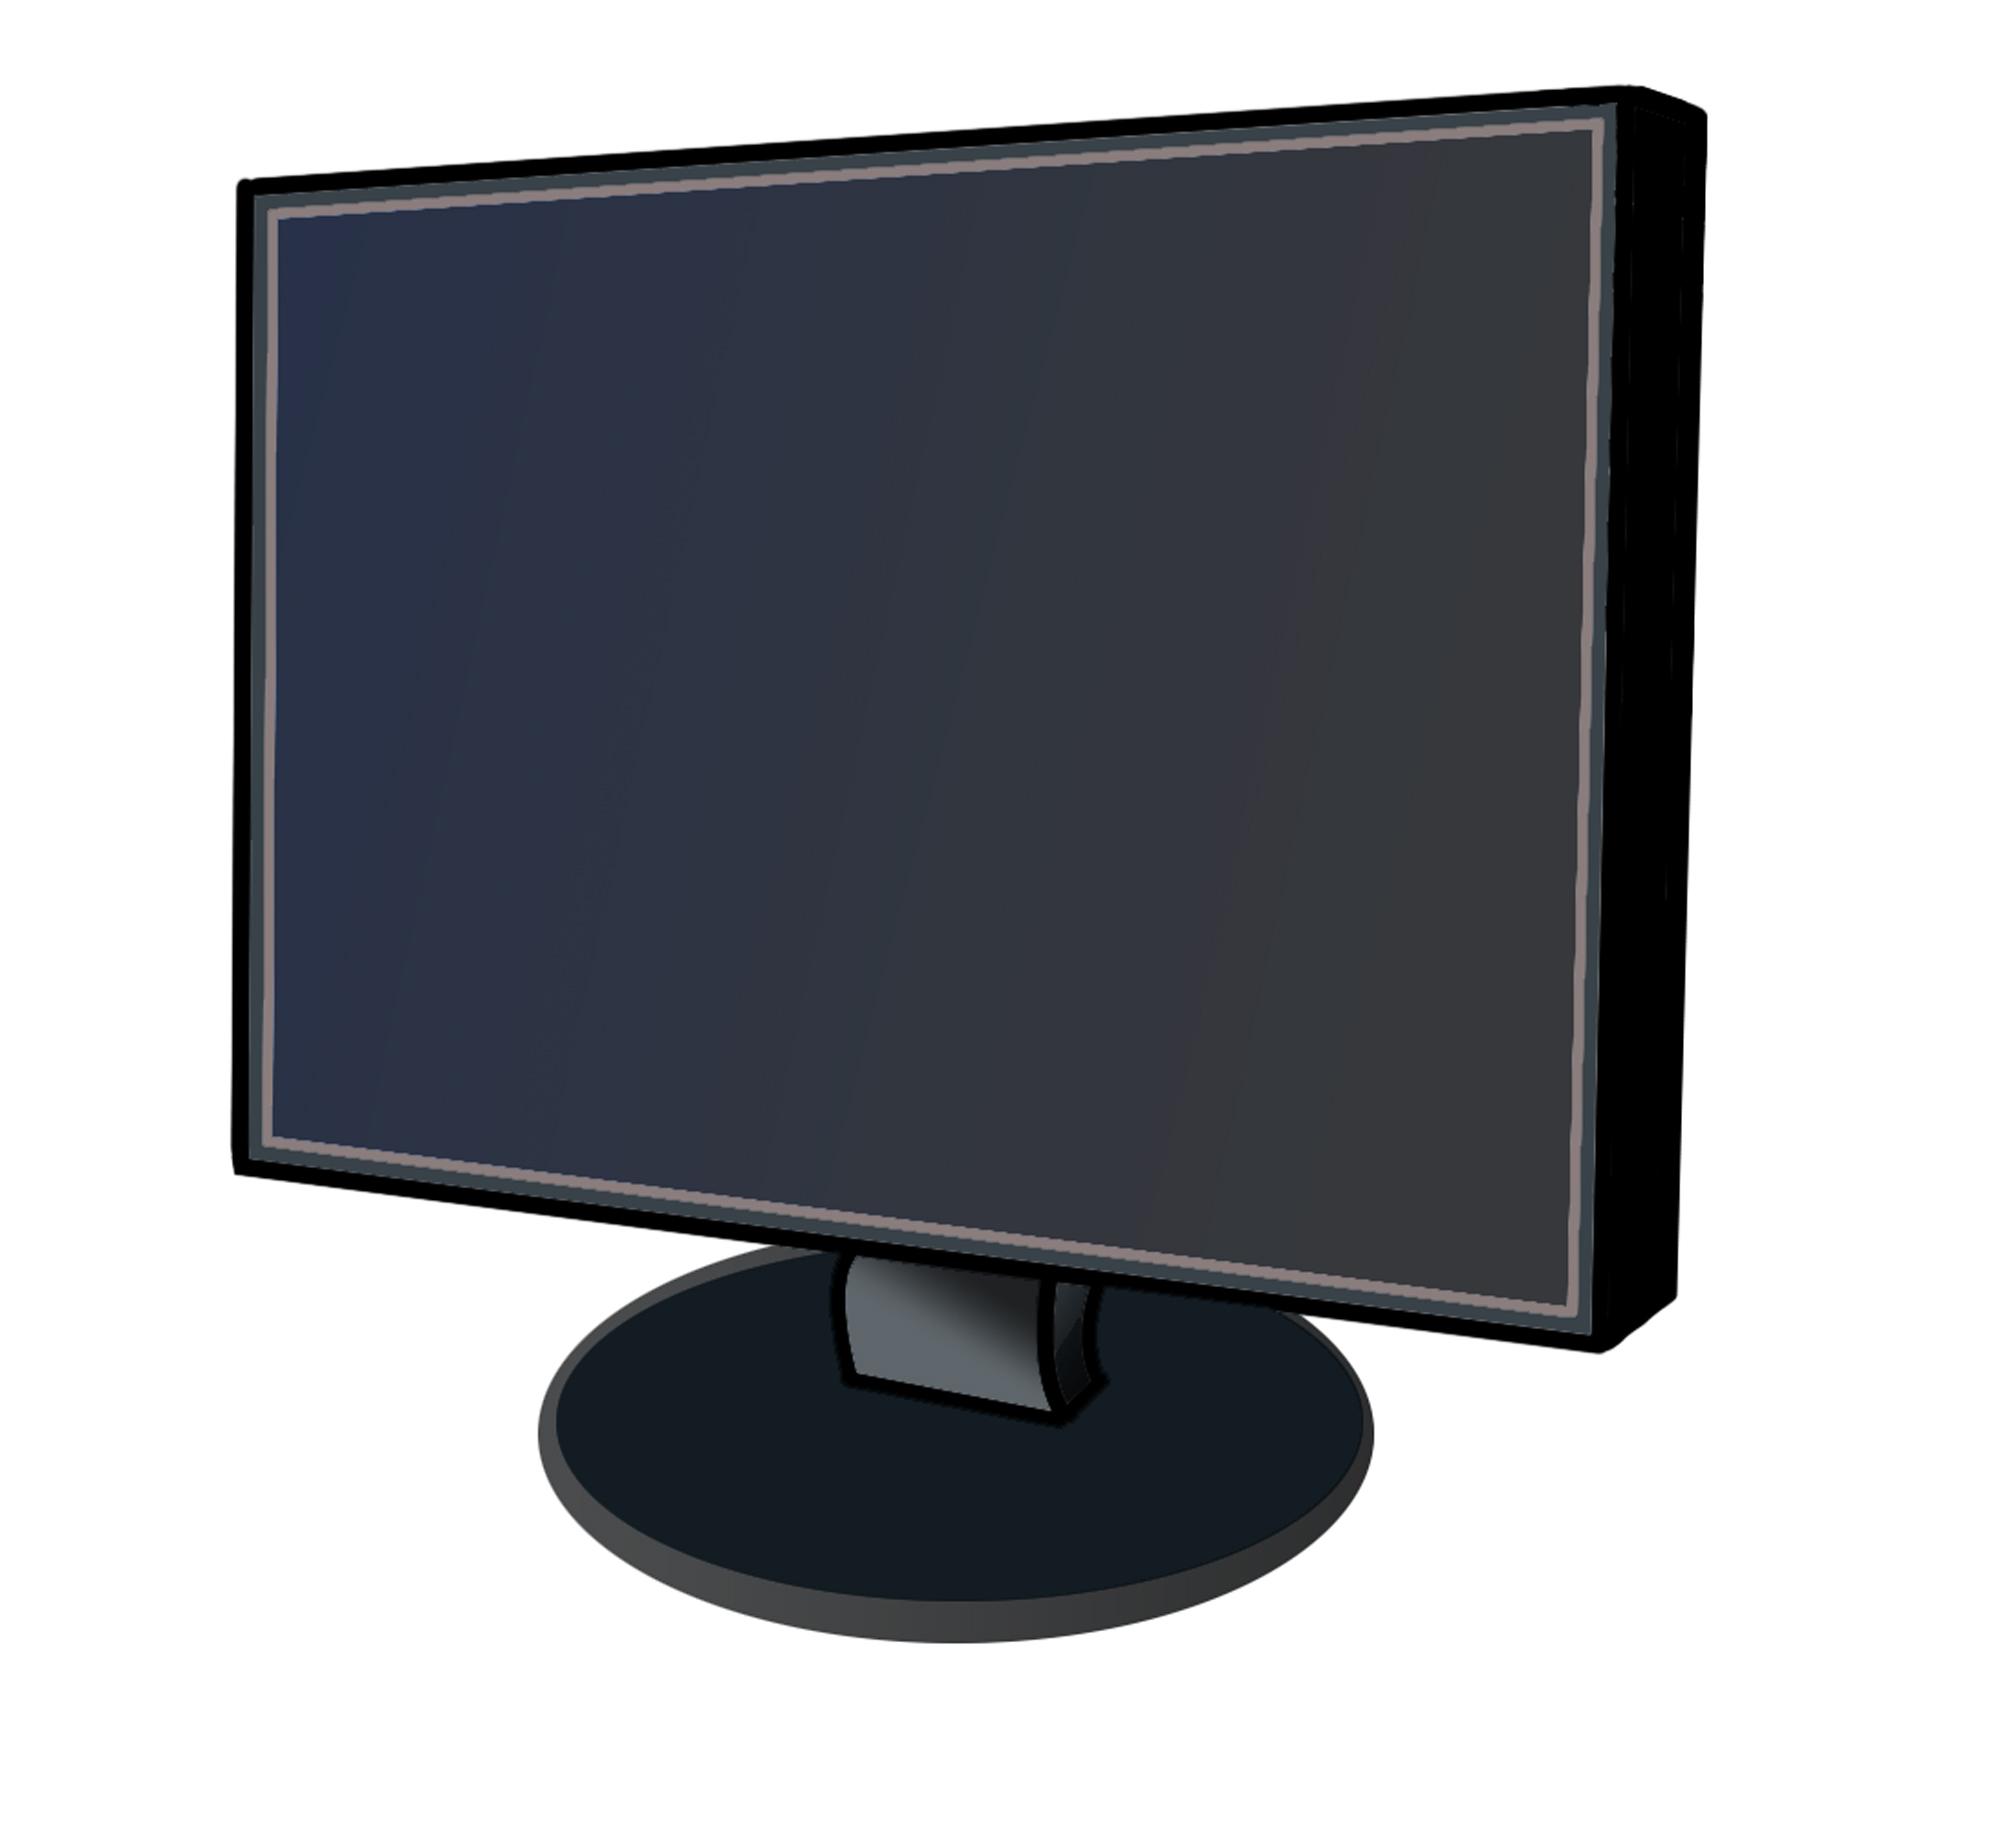 Computer Monitor Screen Clip Art Images -Computer Monitor Screen Clip Art Images Pictures - Becuo-2